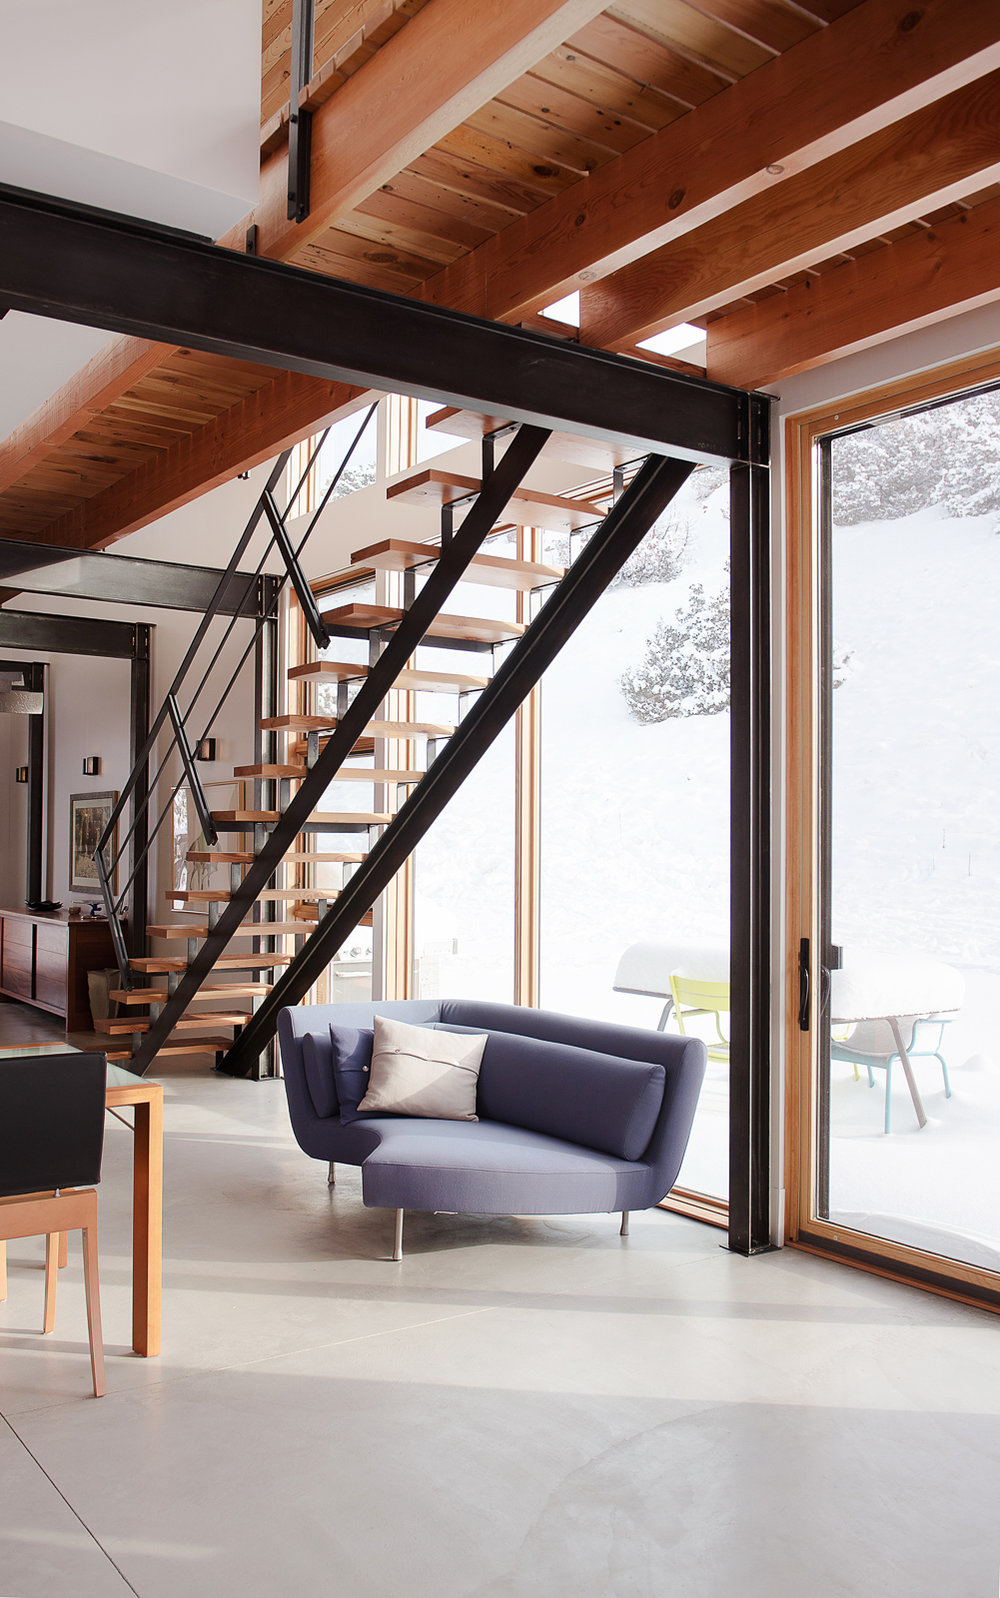 Woodworks-West-Bozeman-Montana-Builder-Cabinetry-Remodel-New-Construction-4384.jpg